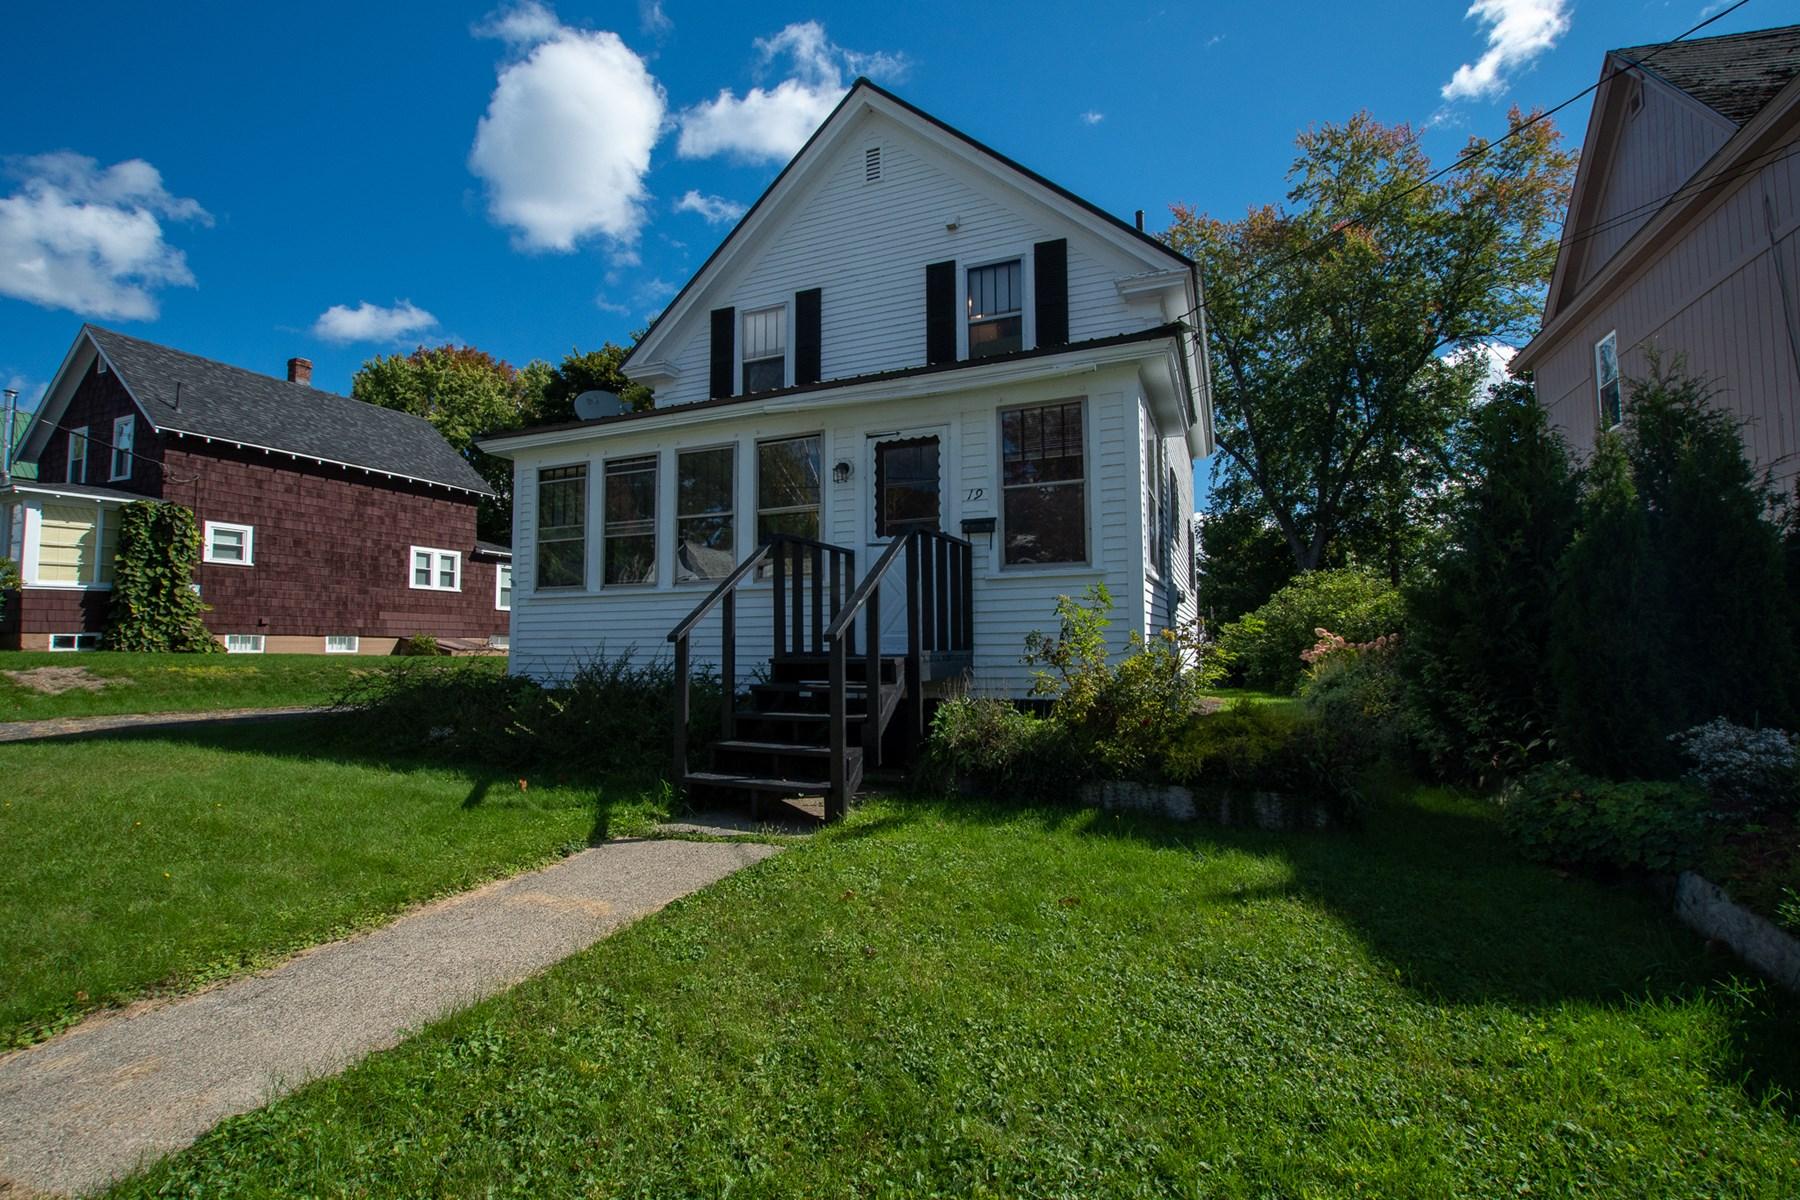 New Englander for sale in East Millinocket, Maine